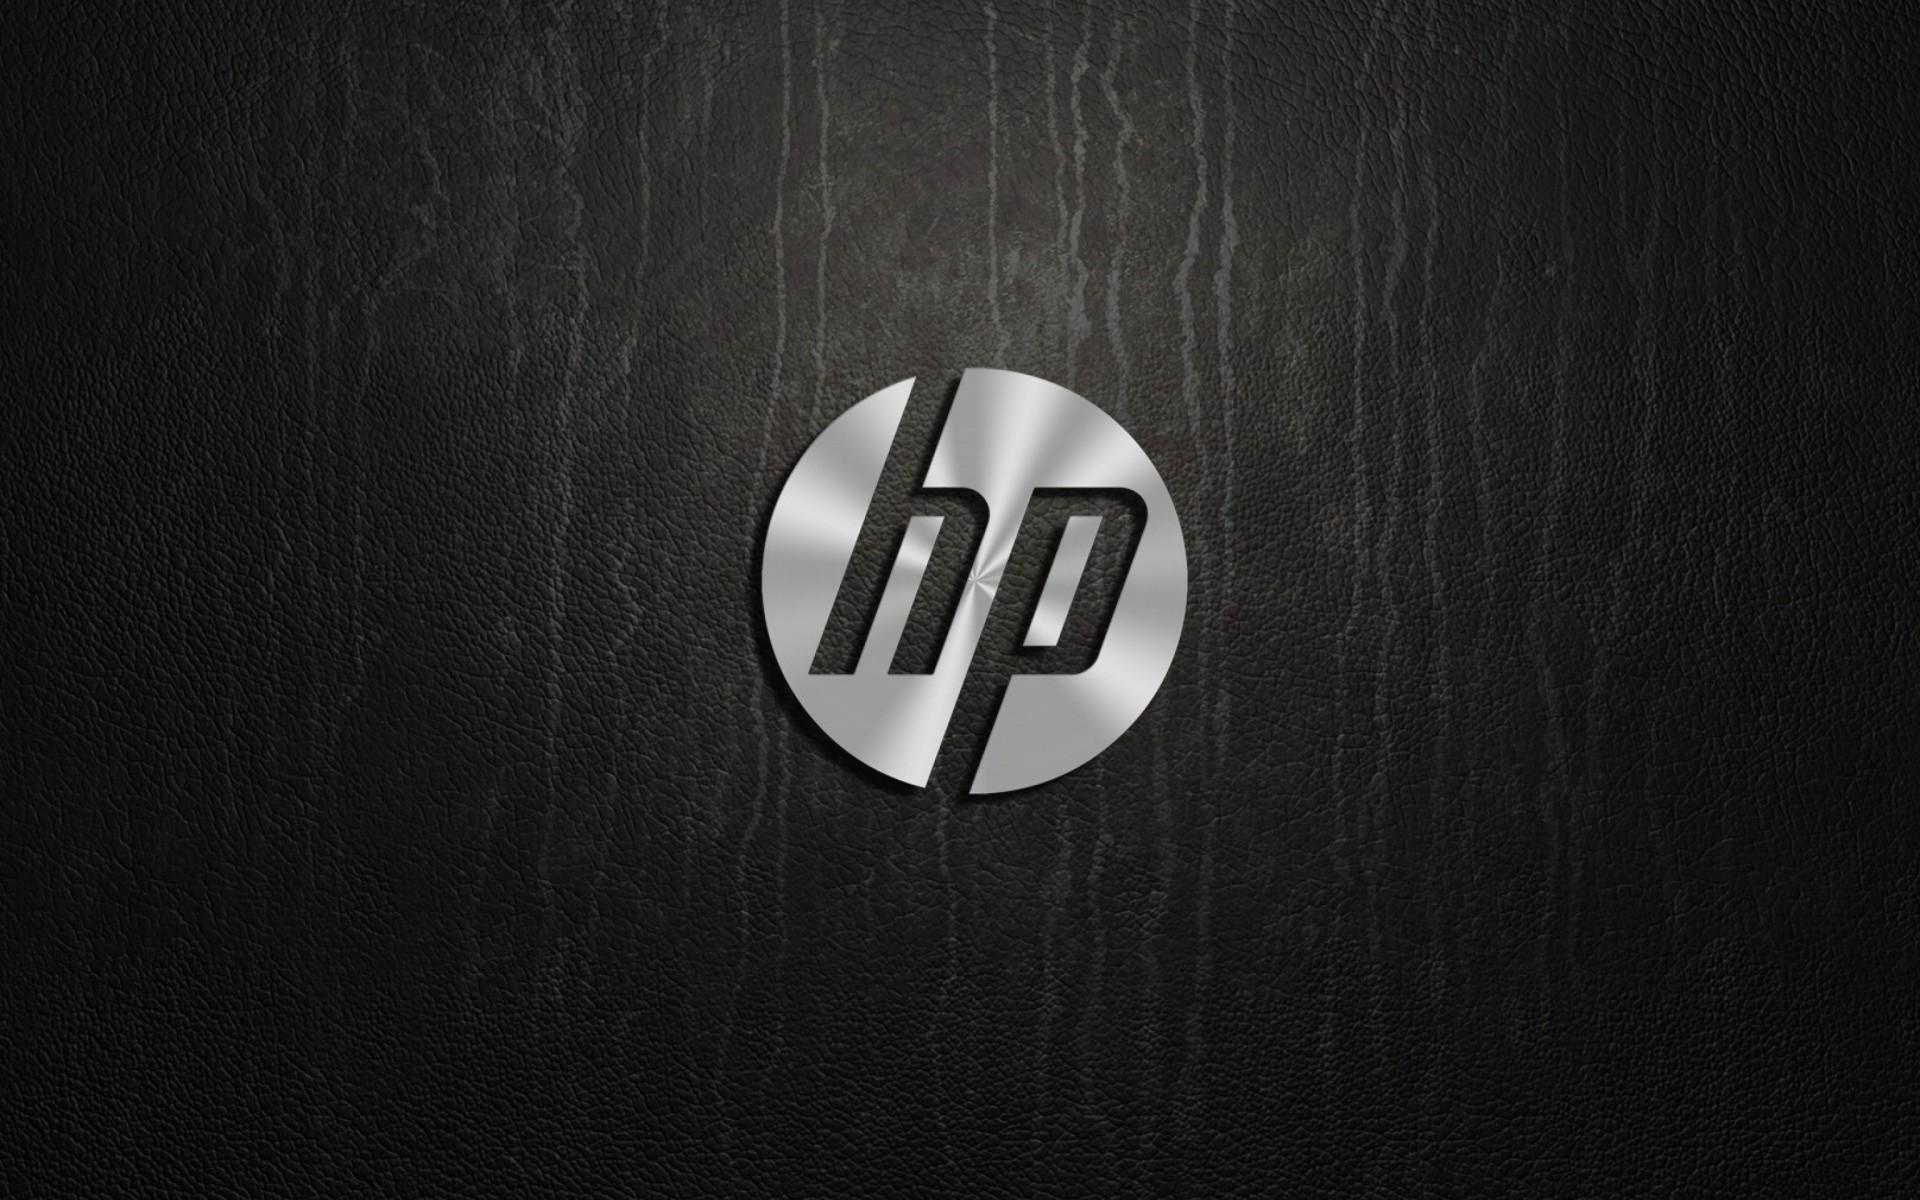 HP Logo Wallpaper 57 Images